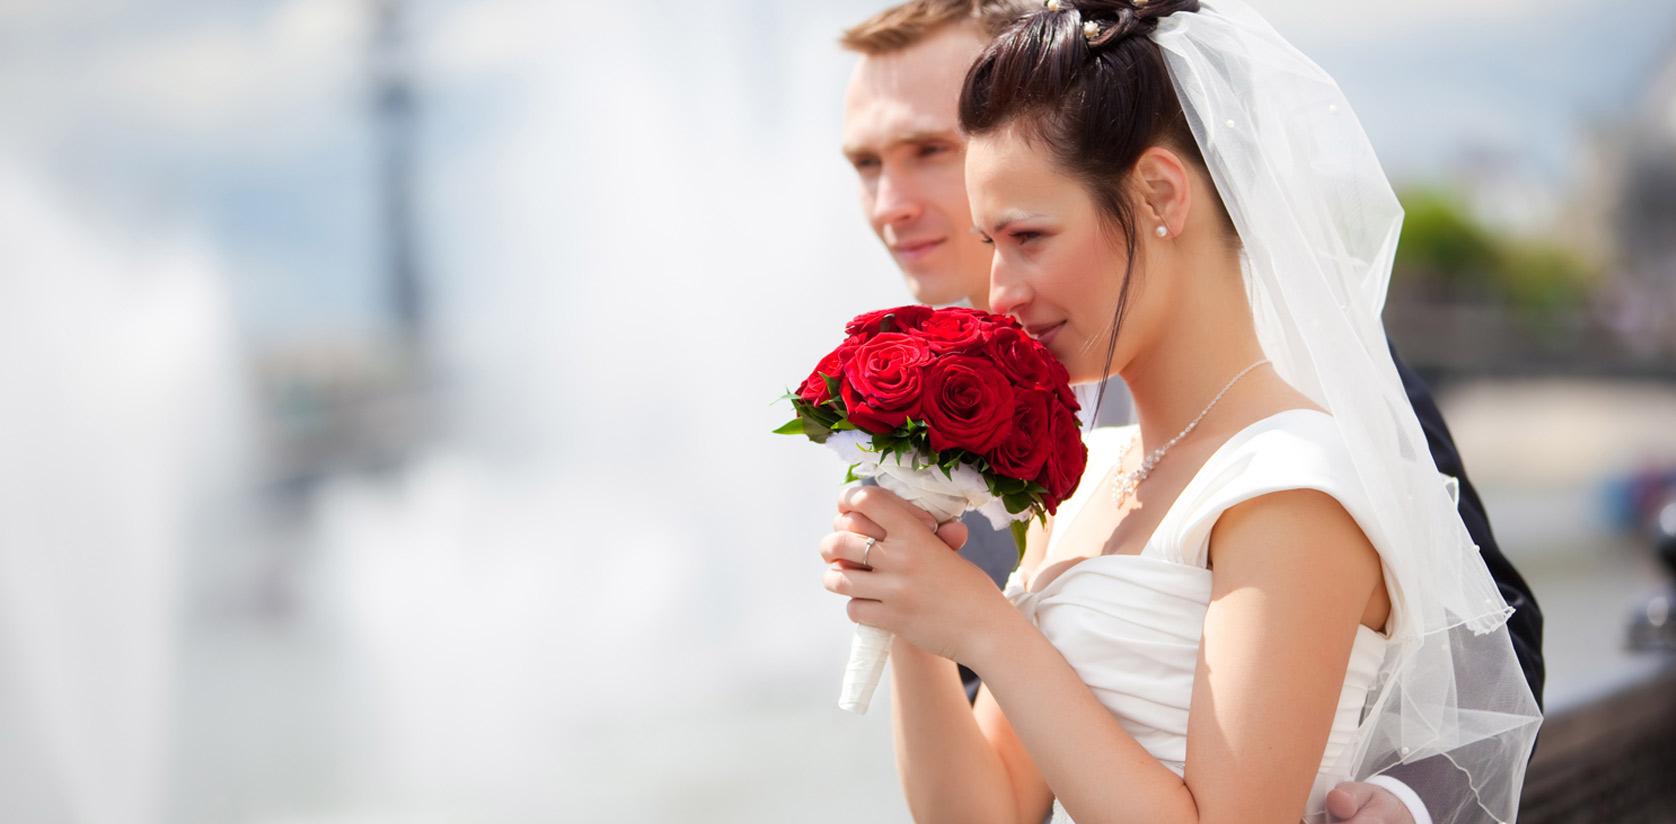 Bridal Elegance Wedding Dresses in Colorado Springs – Bridal Elegance